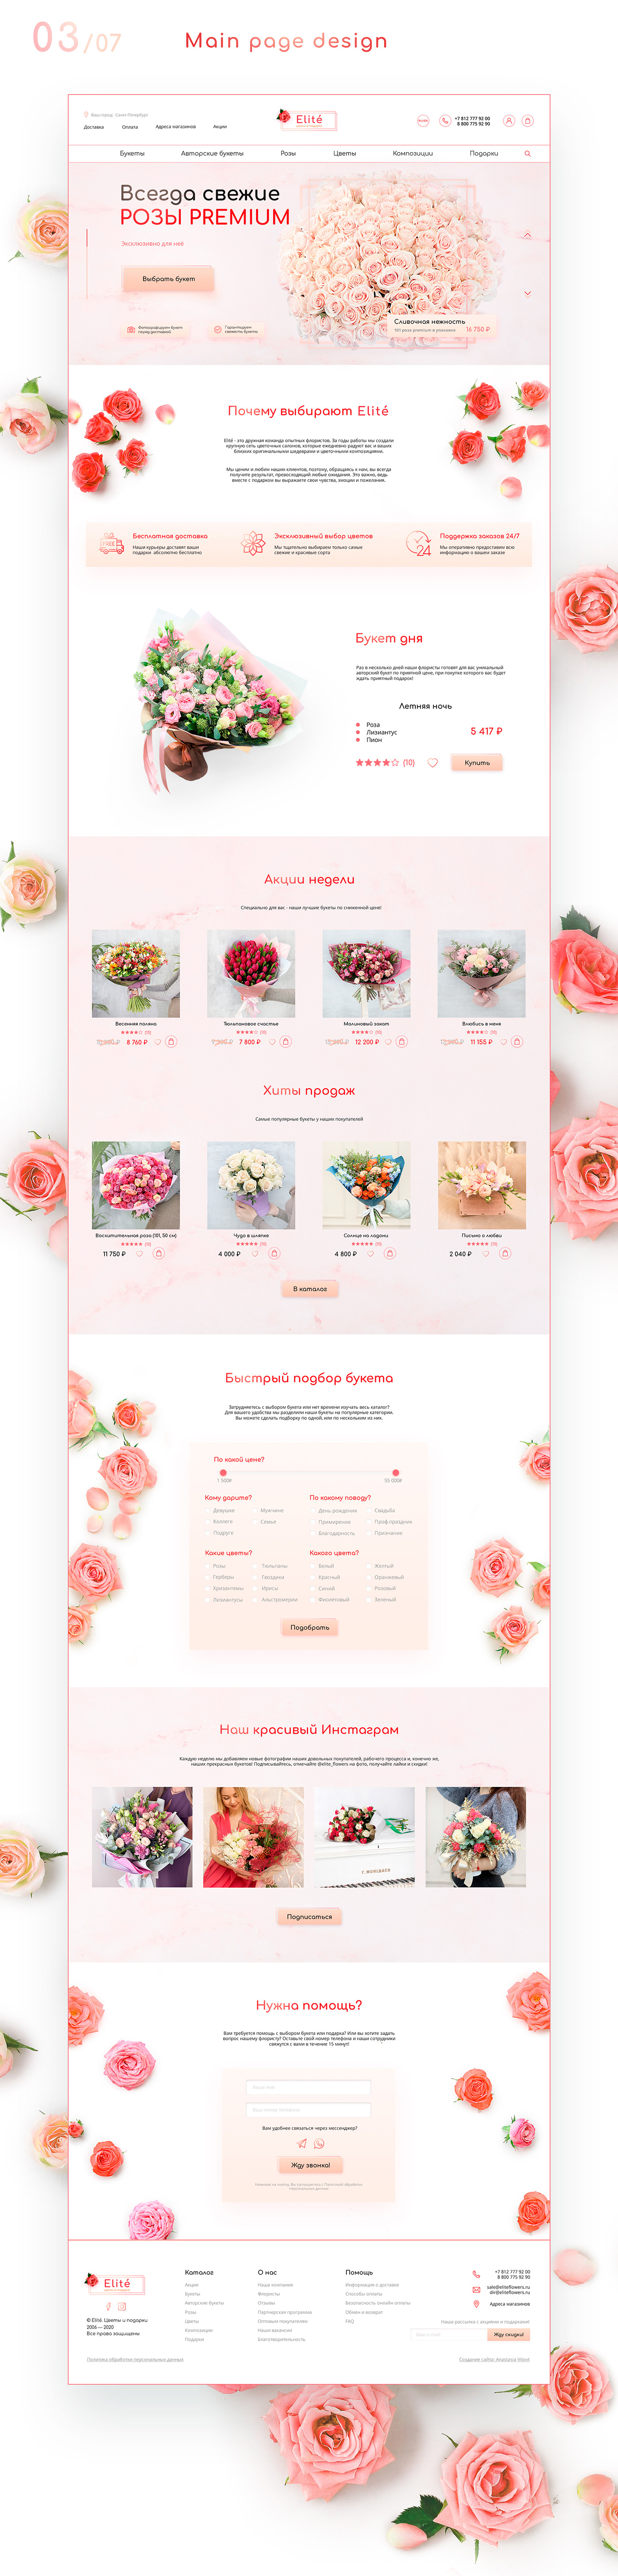 Bouquet delivery Ecommerce Flowers gift landing shop store ui kit UX UI